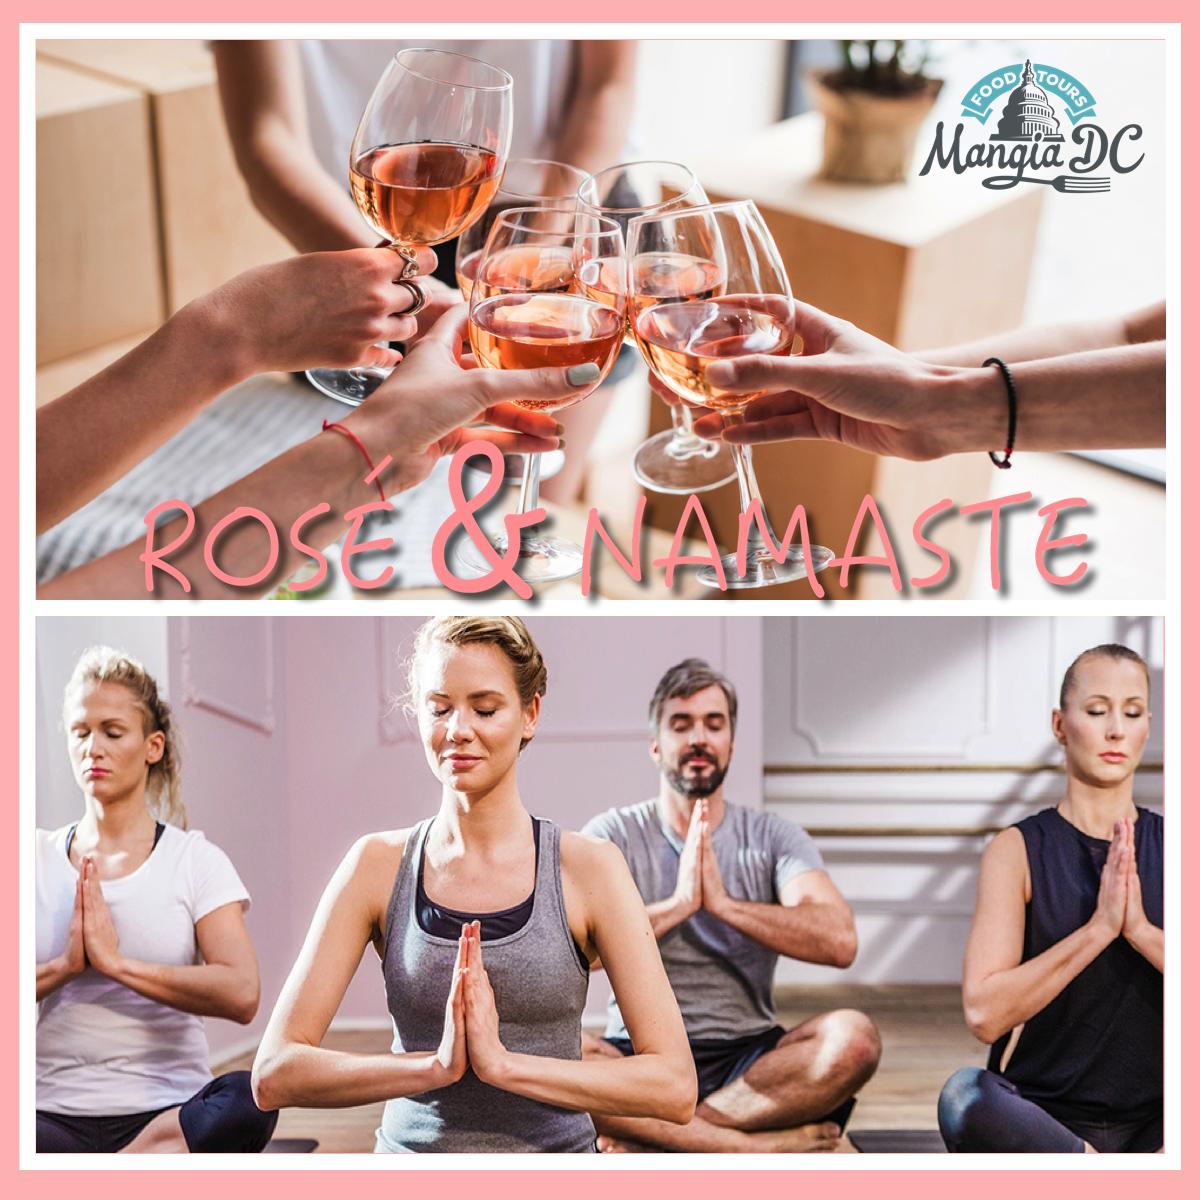 Rose & Namaste Instagram